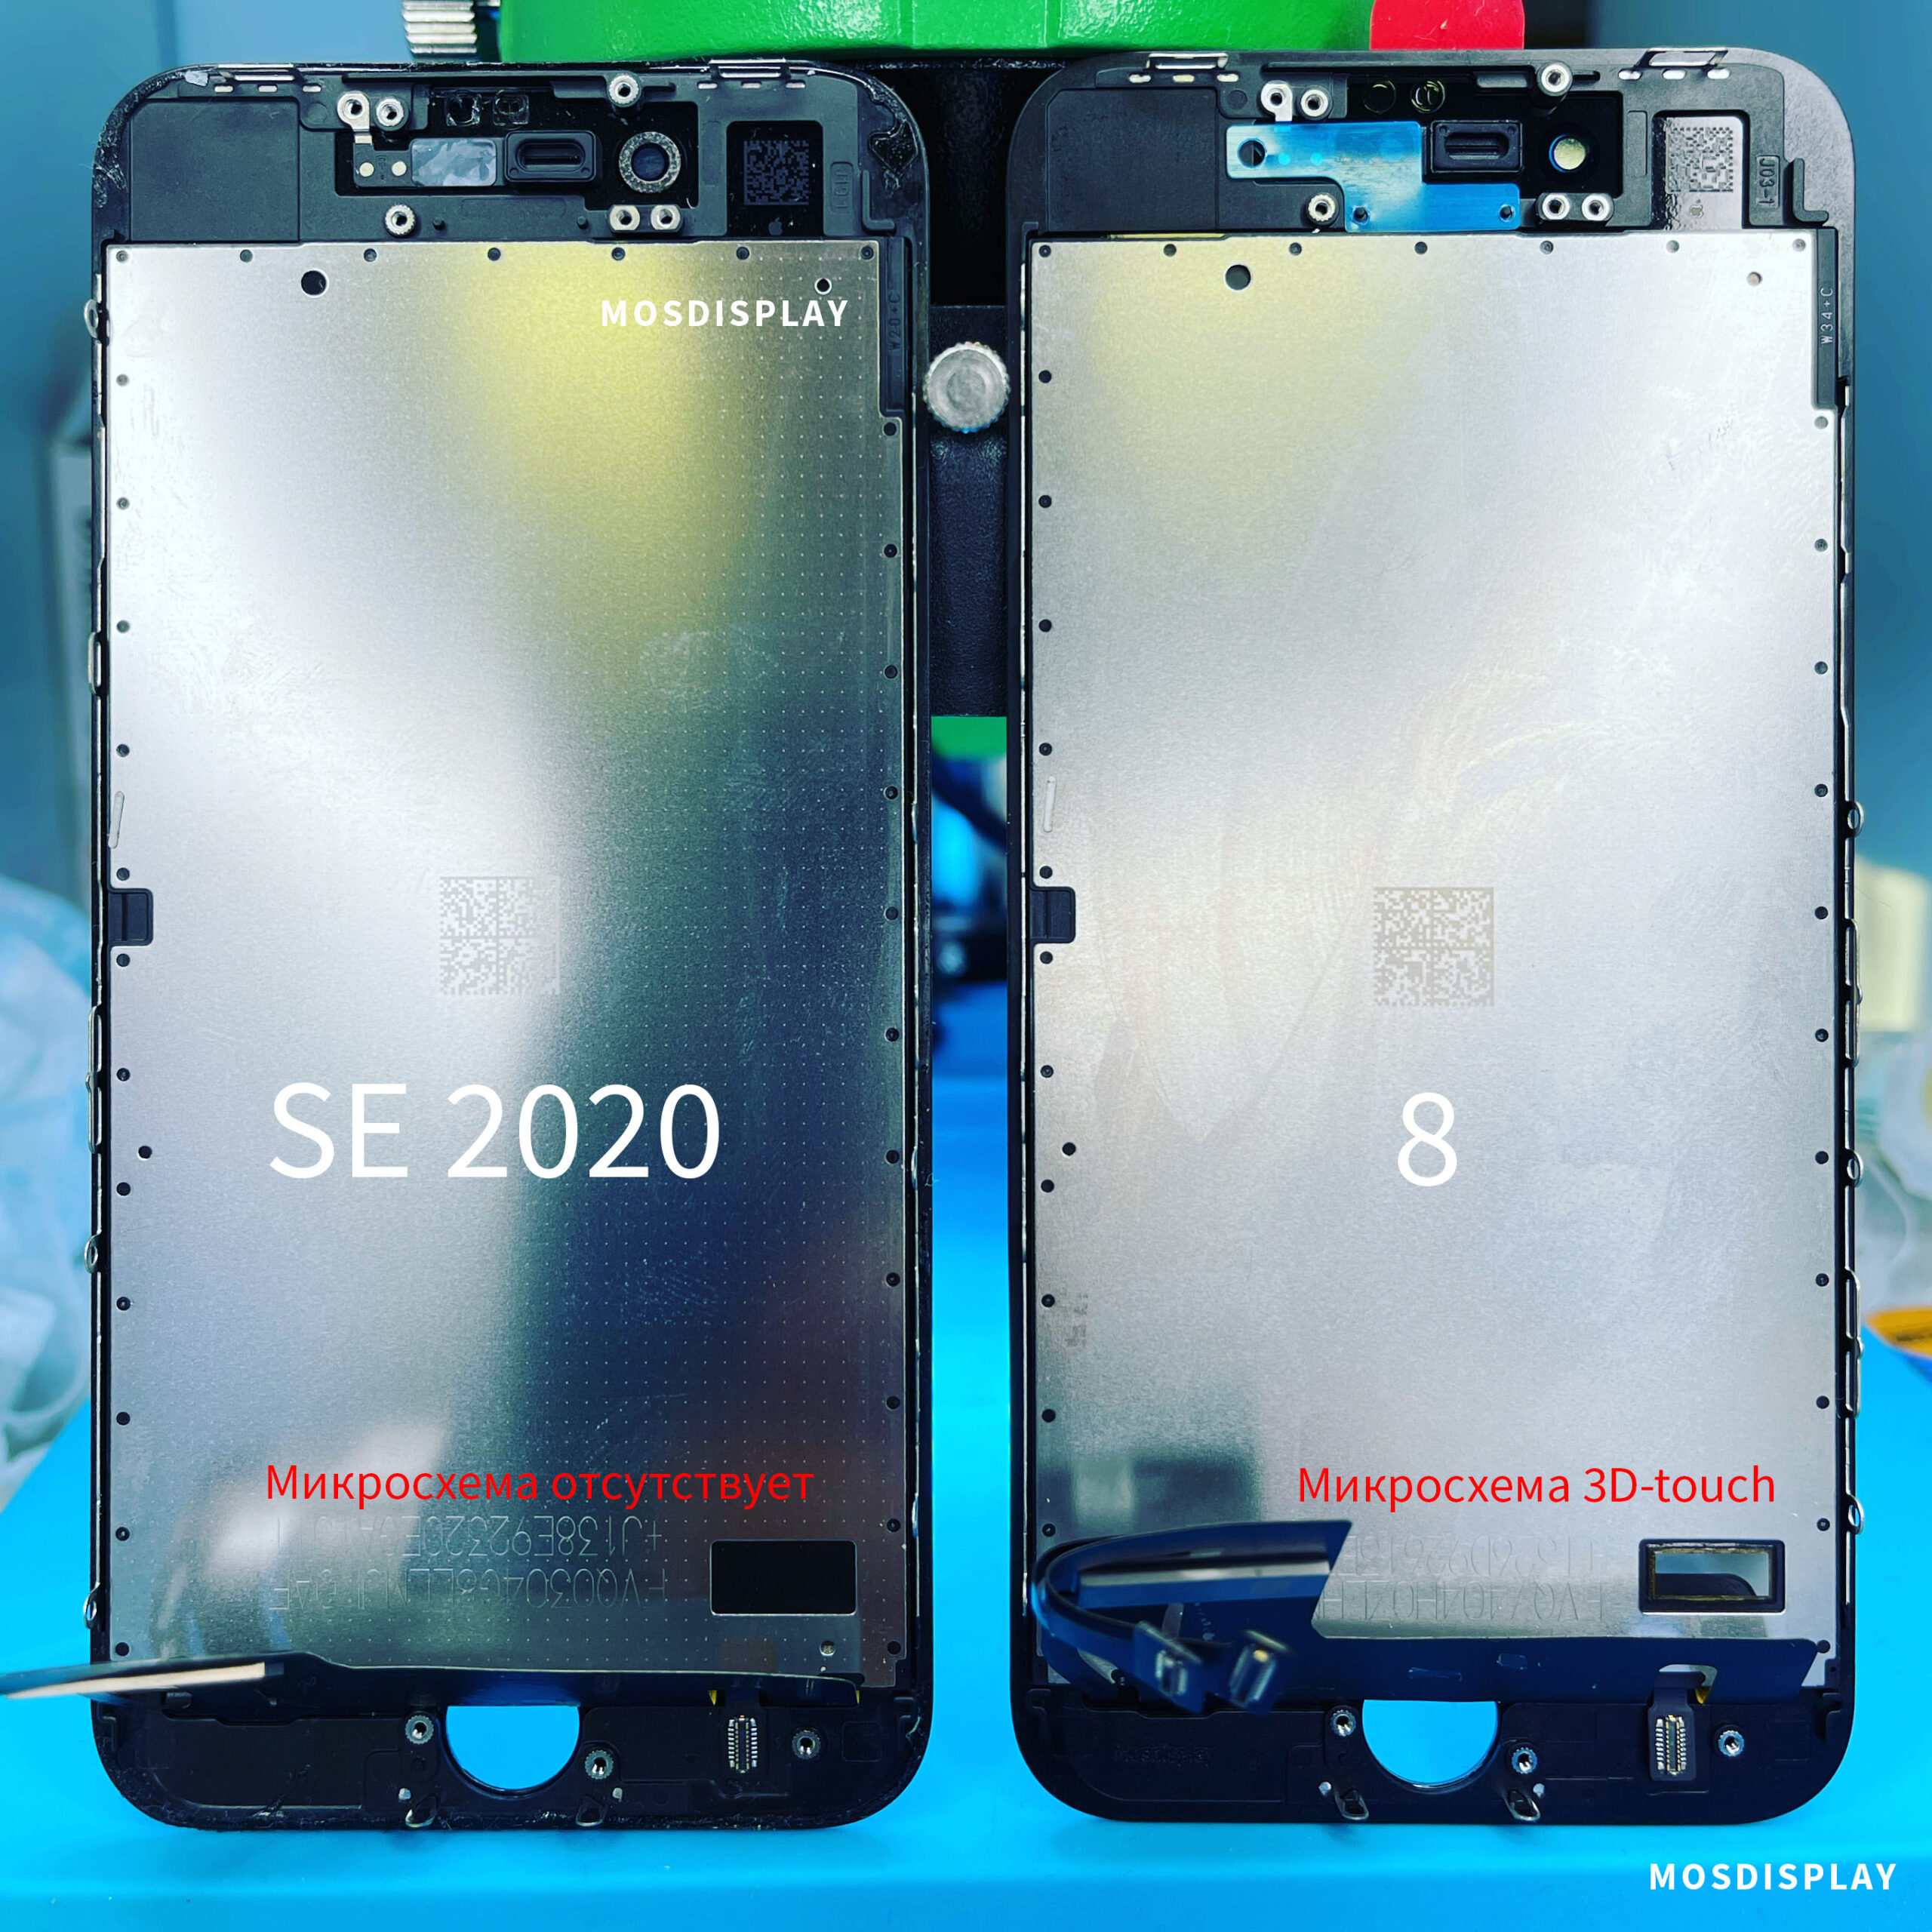 Сравнение дисплея iPhone 8 и iPhone 2020